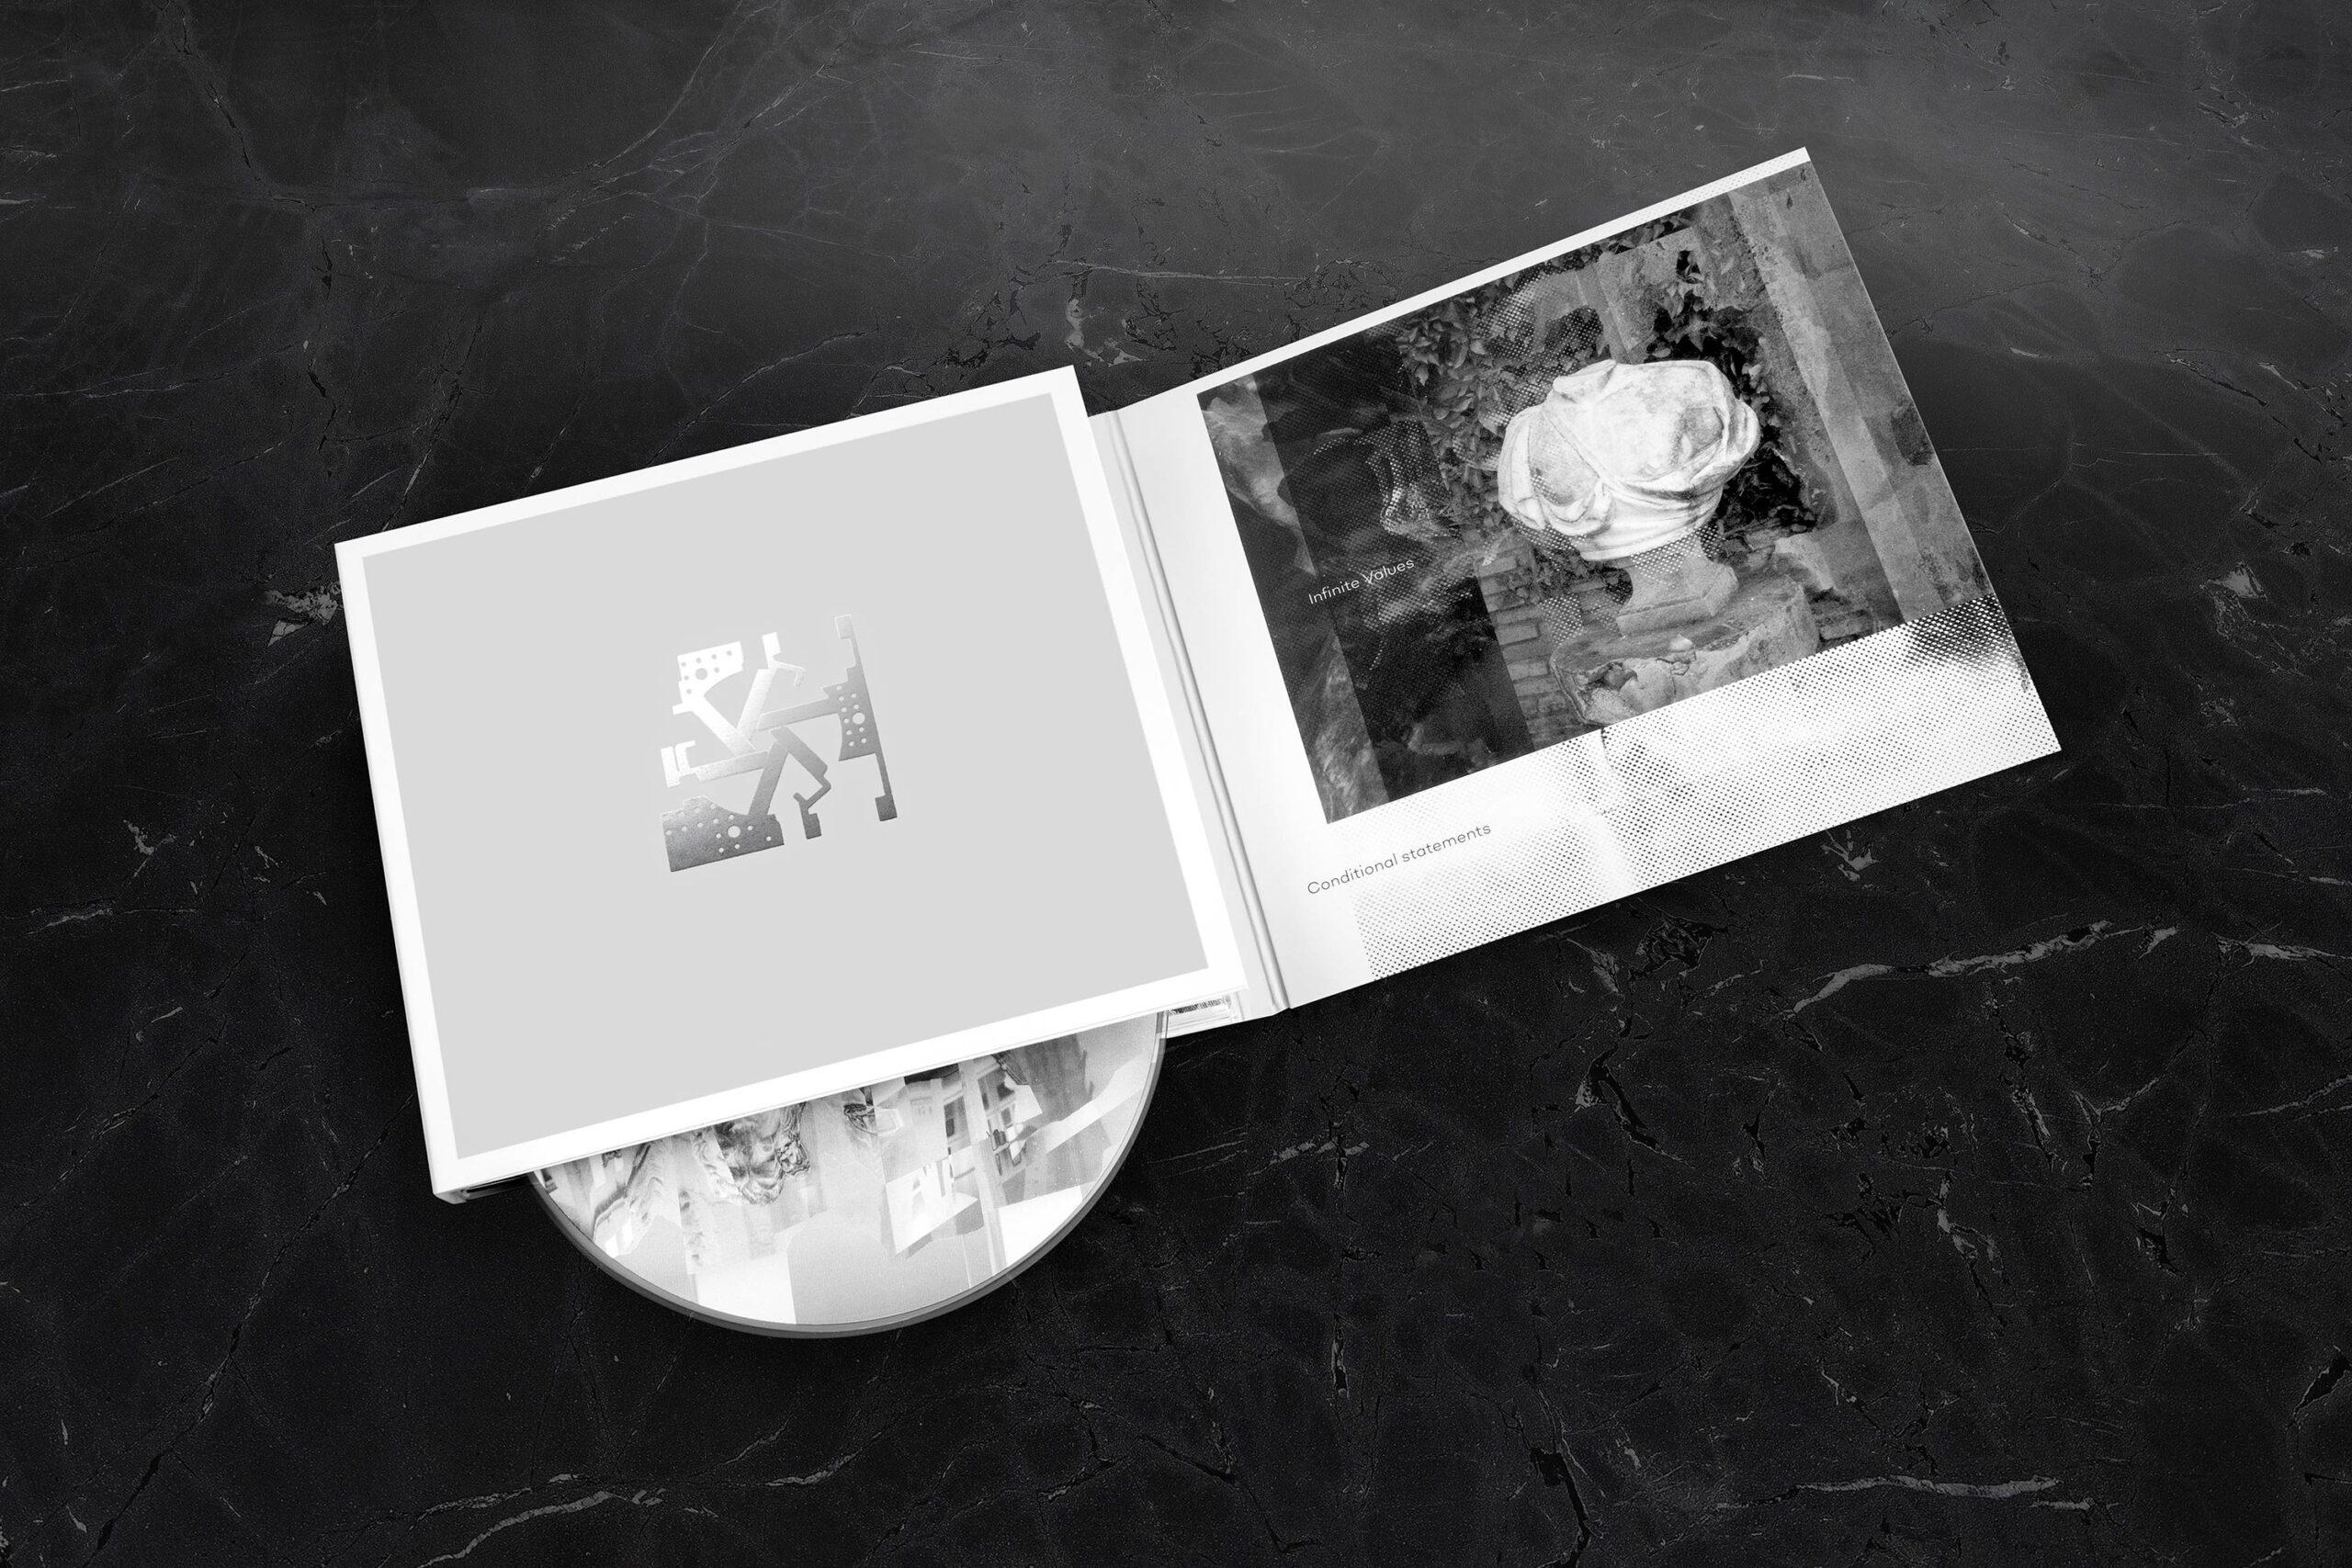 Jacek Doroszenko - Infinite Values, music album 12